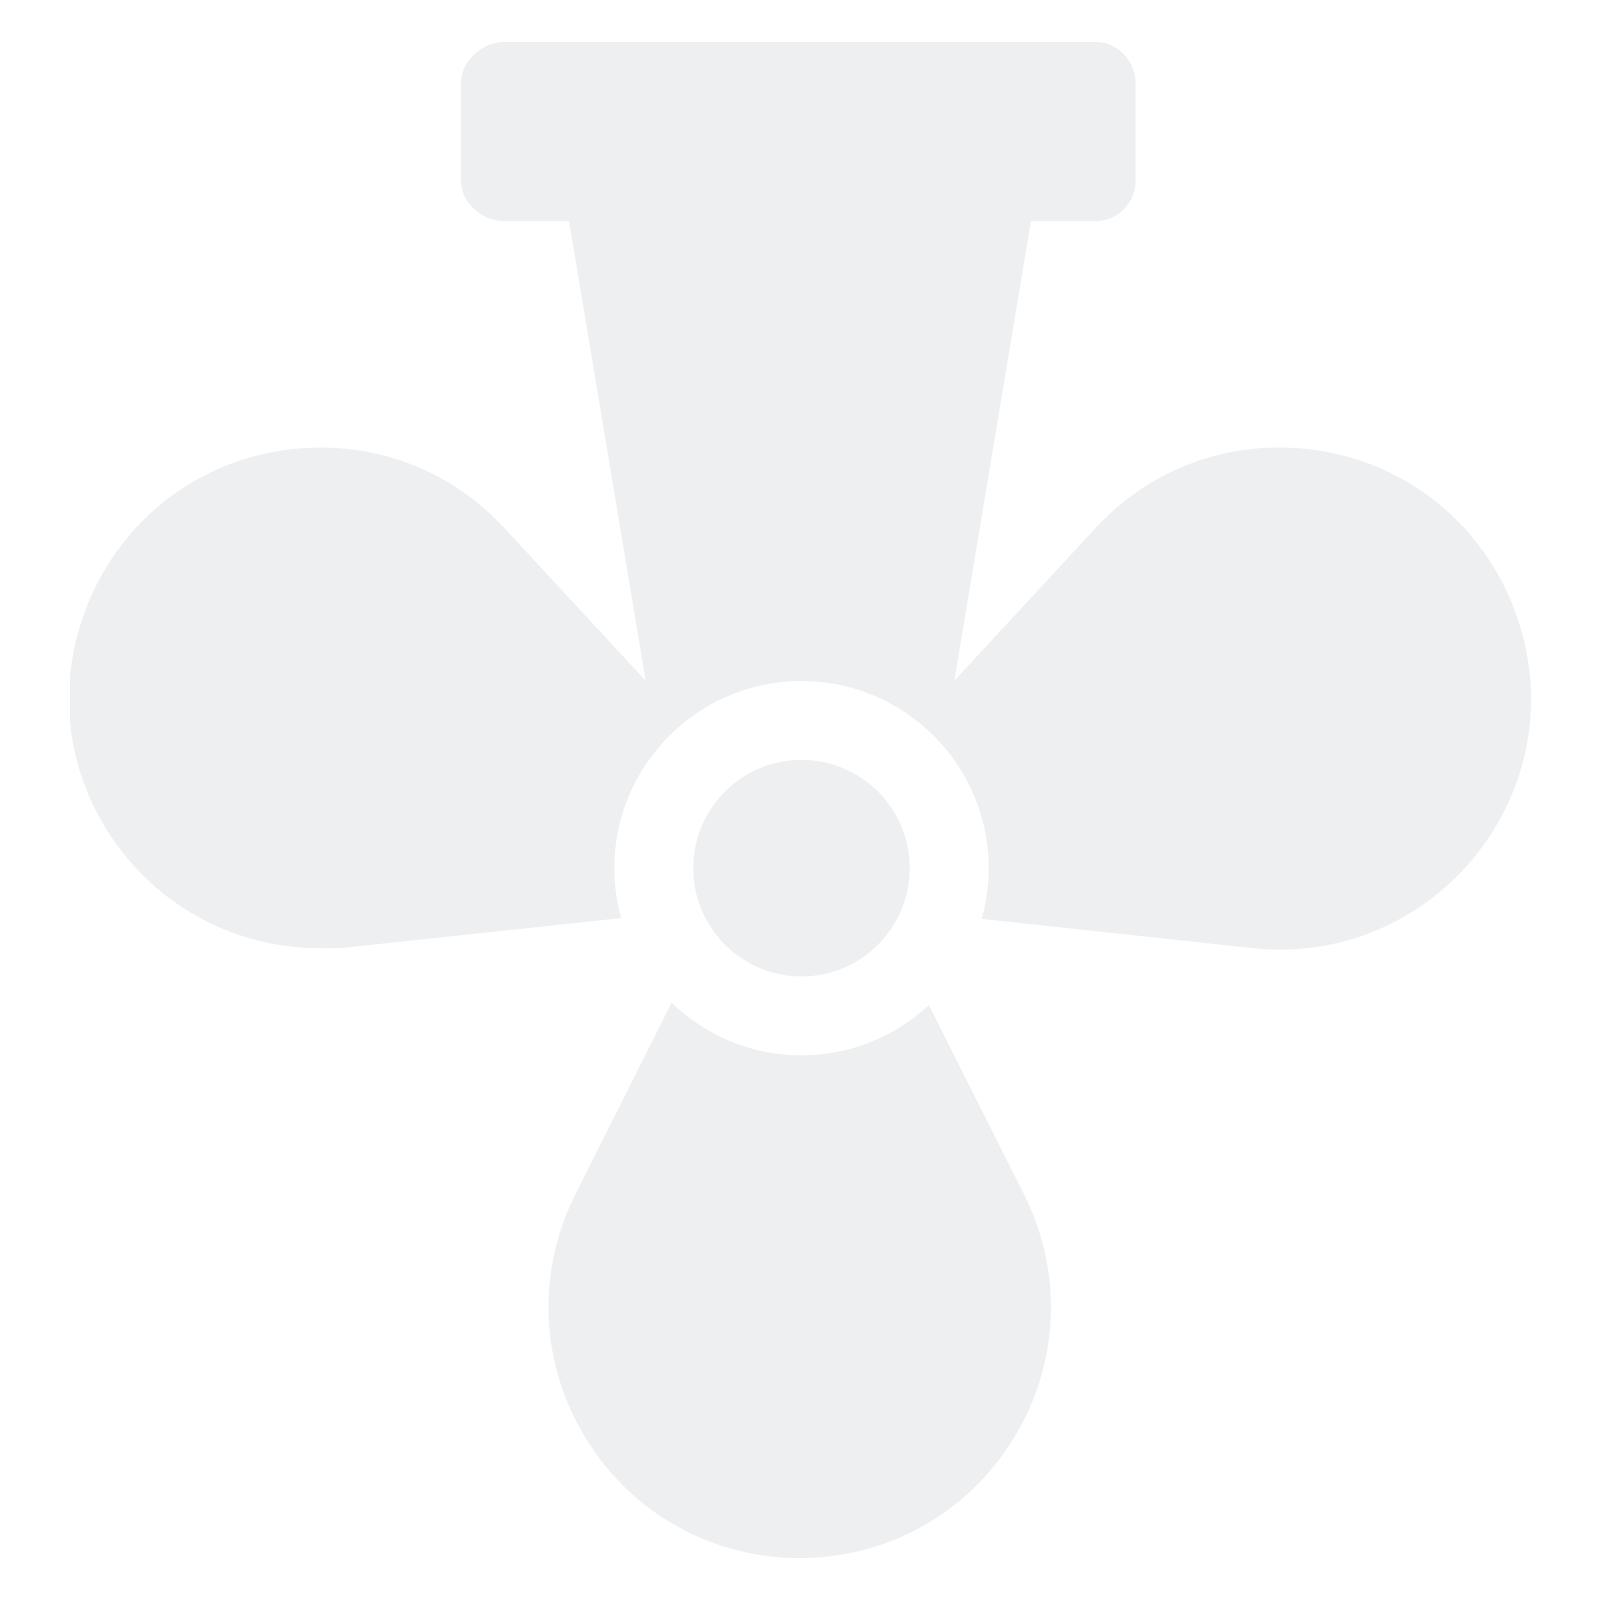 Full-Service-Marinaicon.png